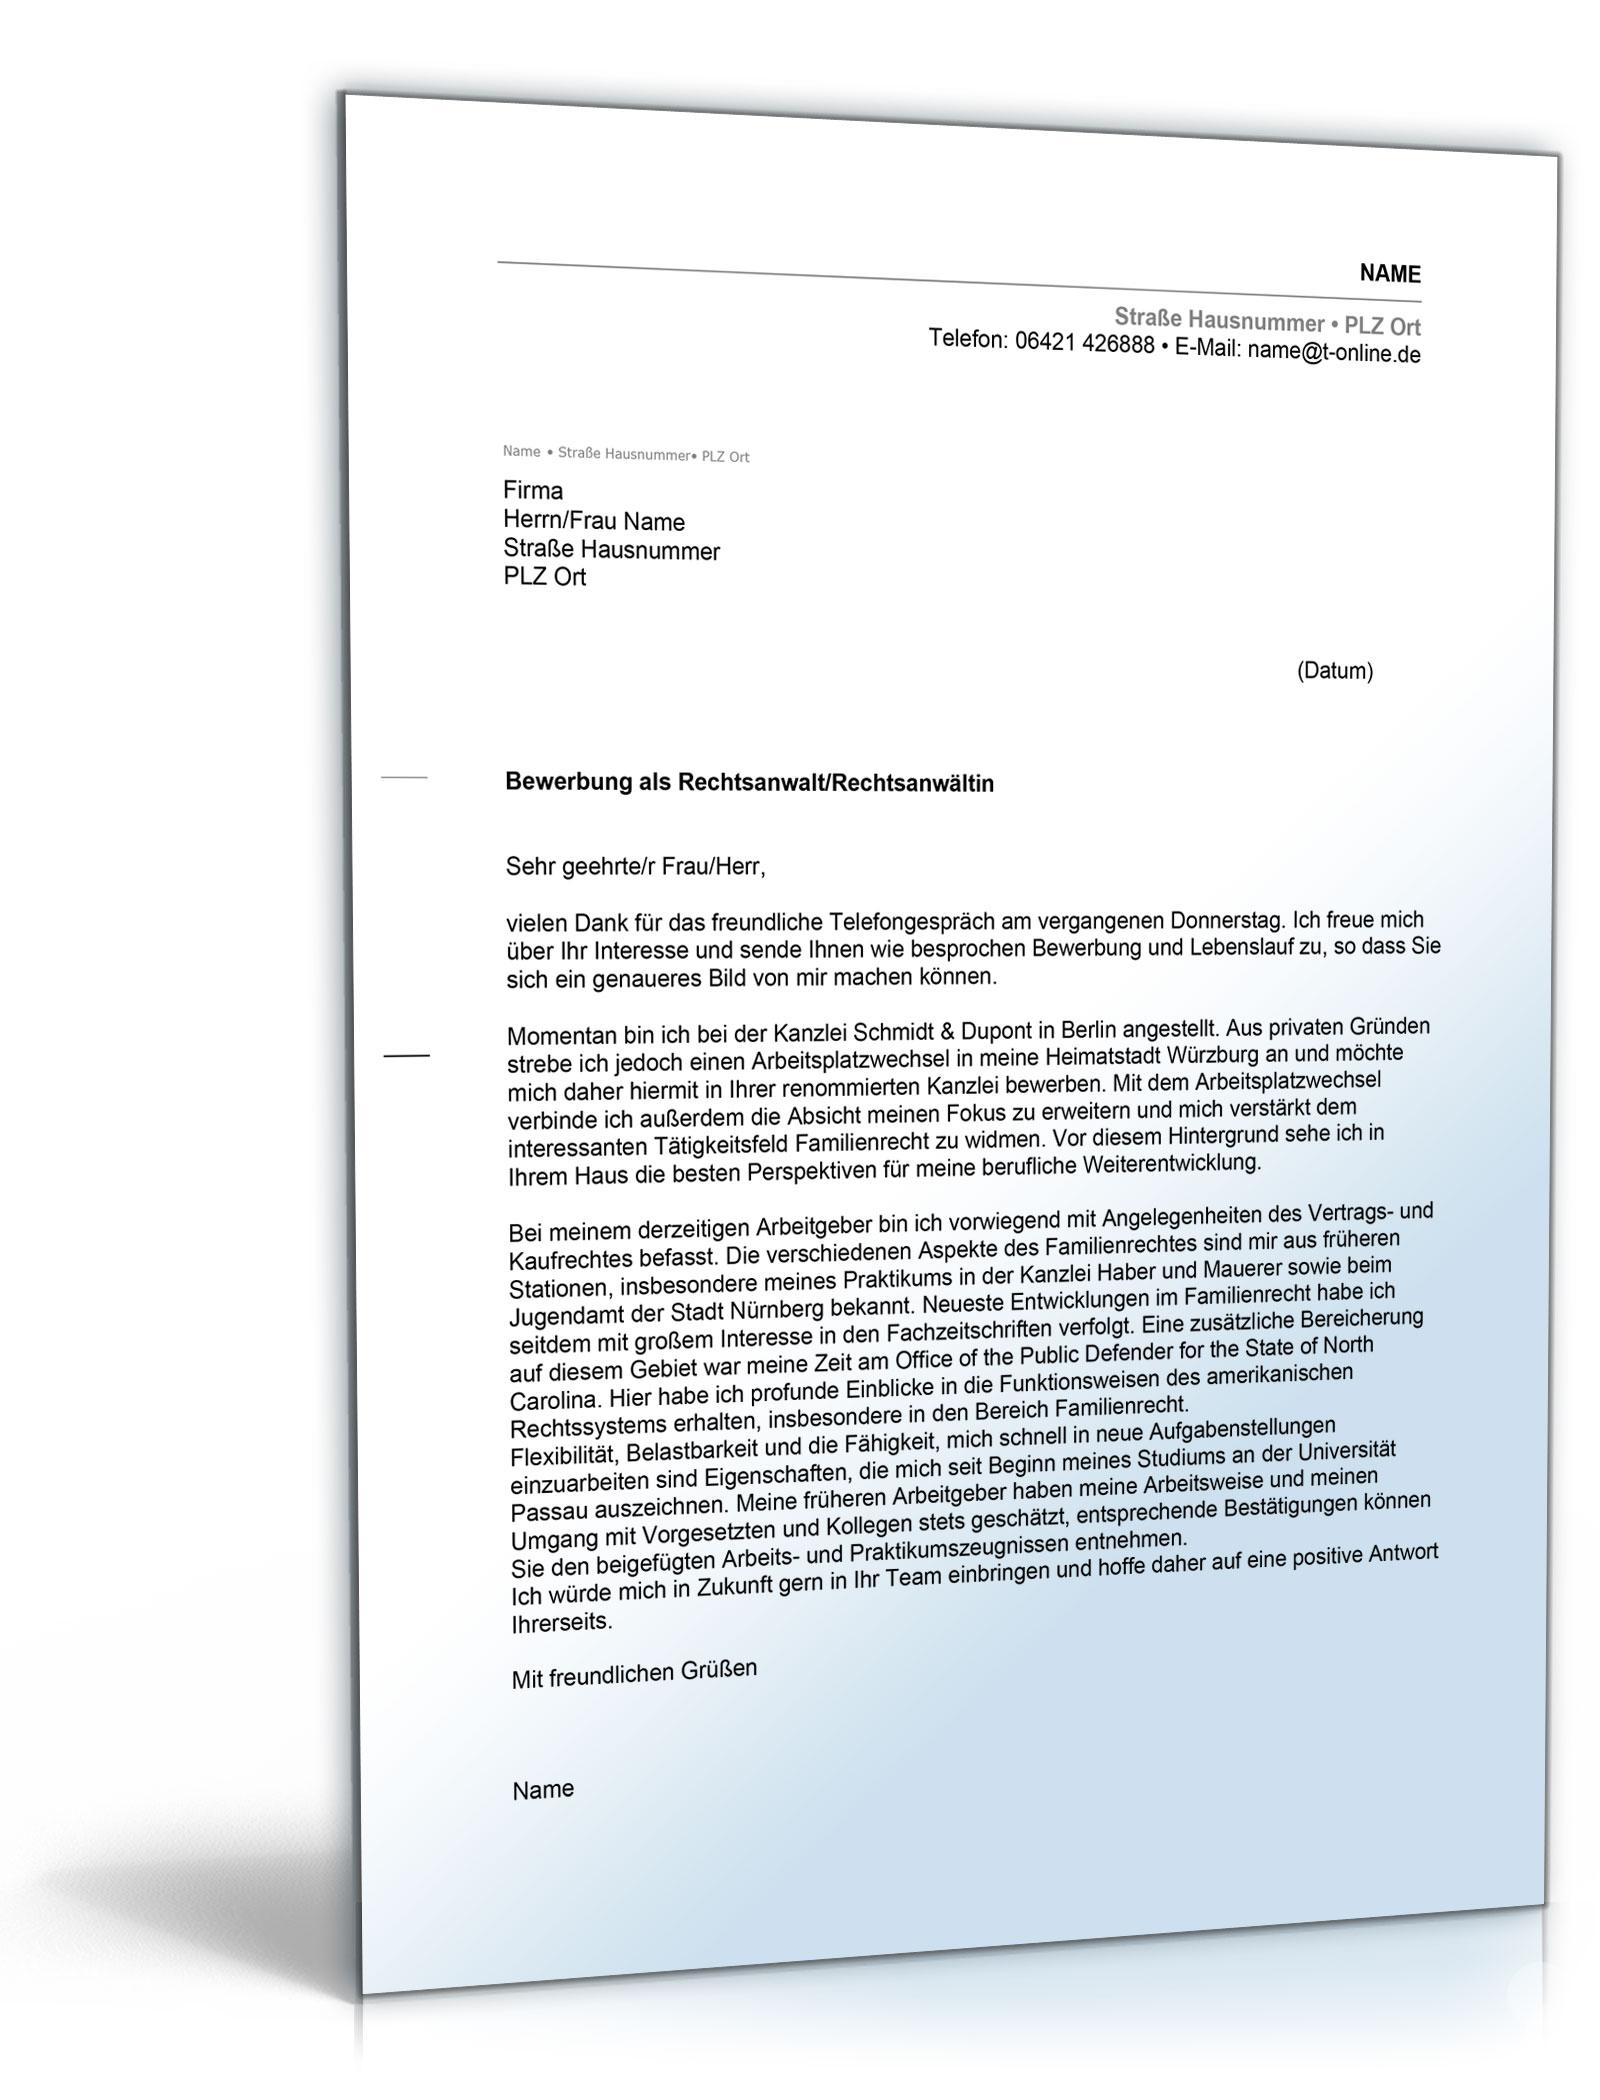 Anschreiben Bewerbung Rechtsanwalt [Word Dokument]: Amazon.de